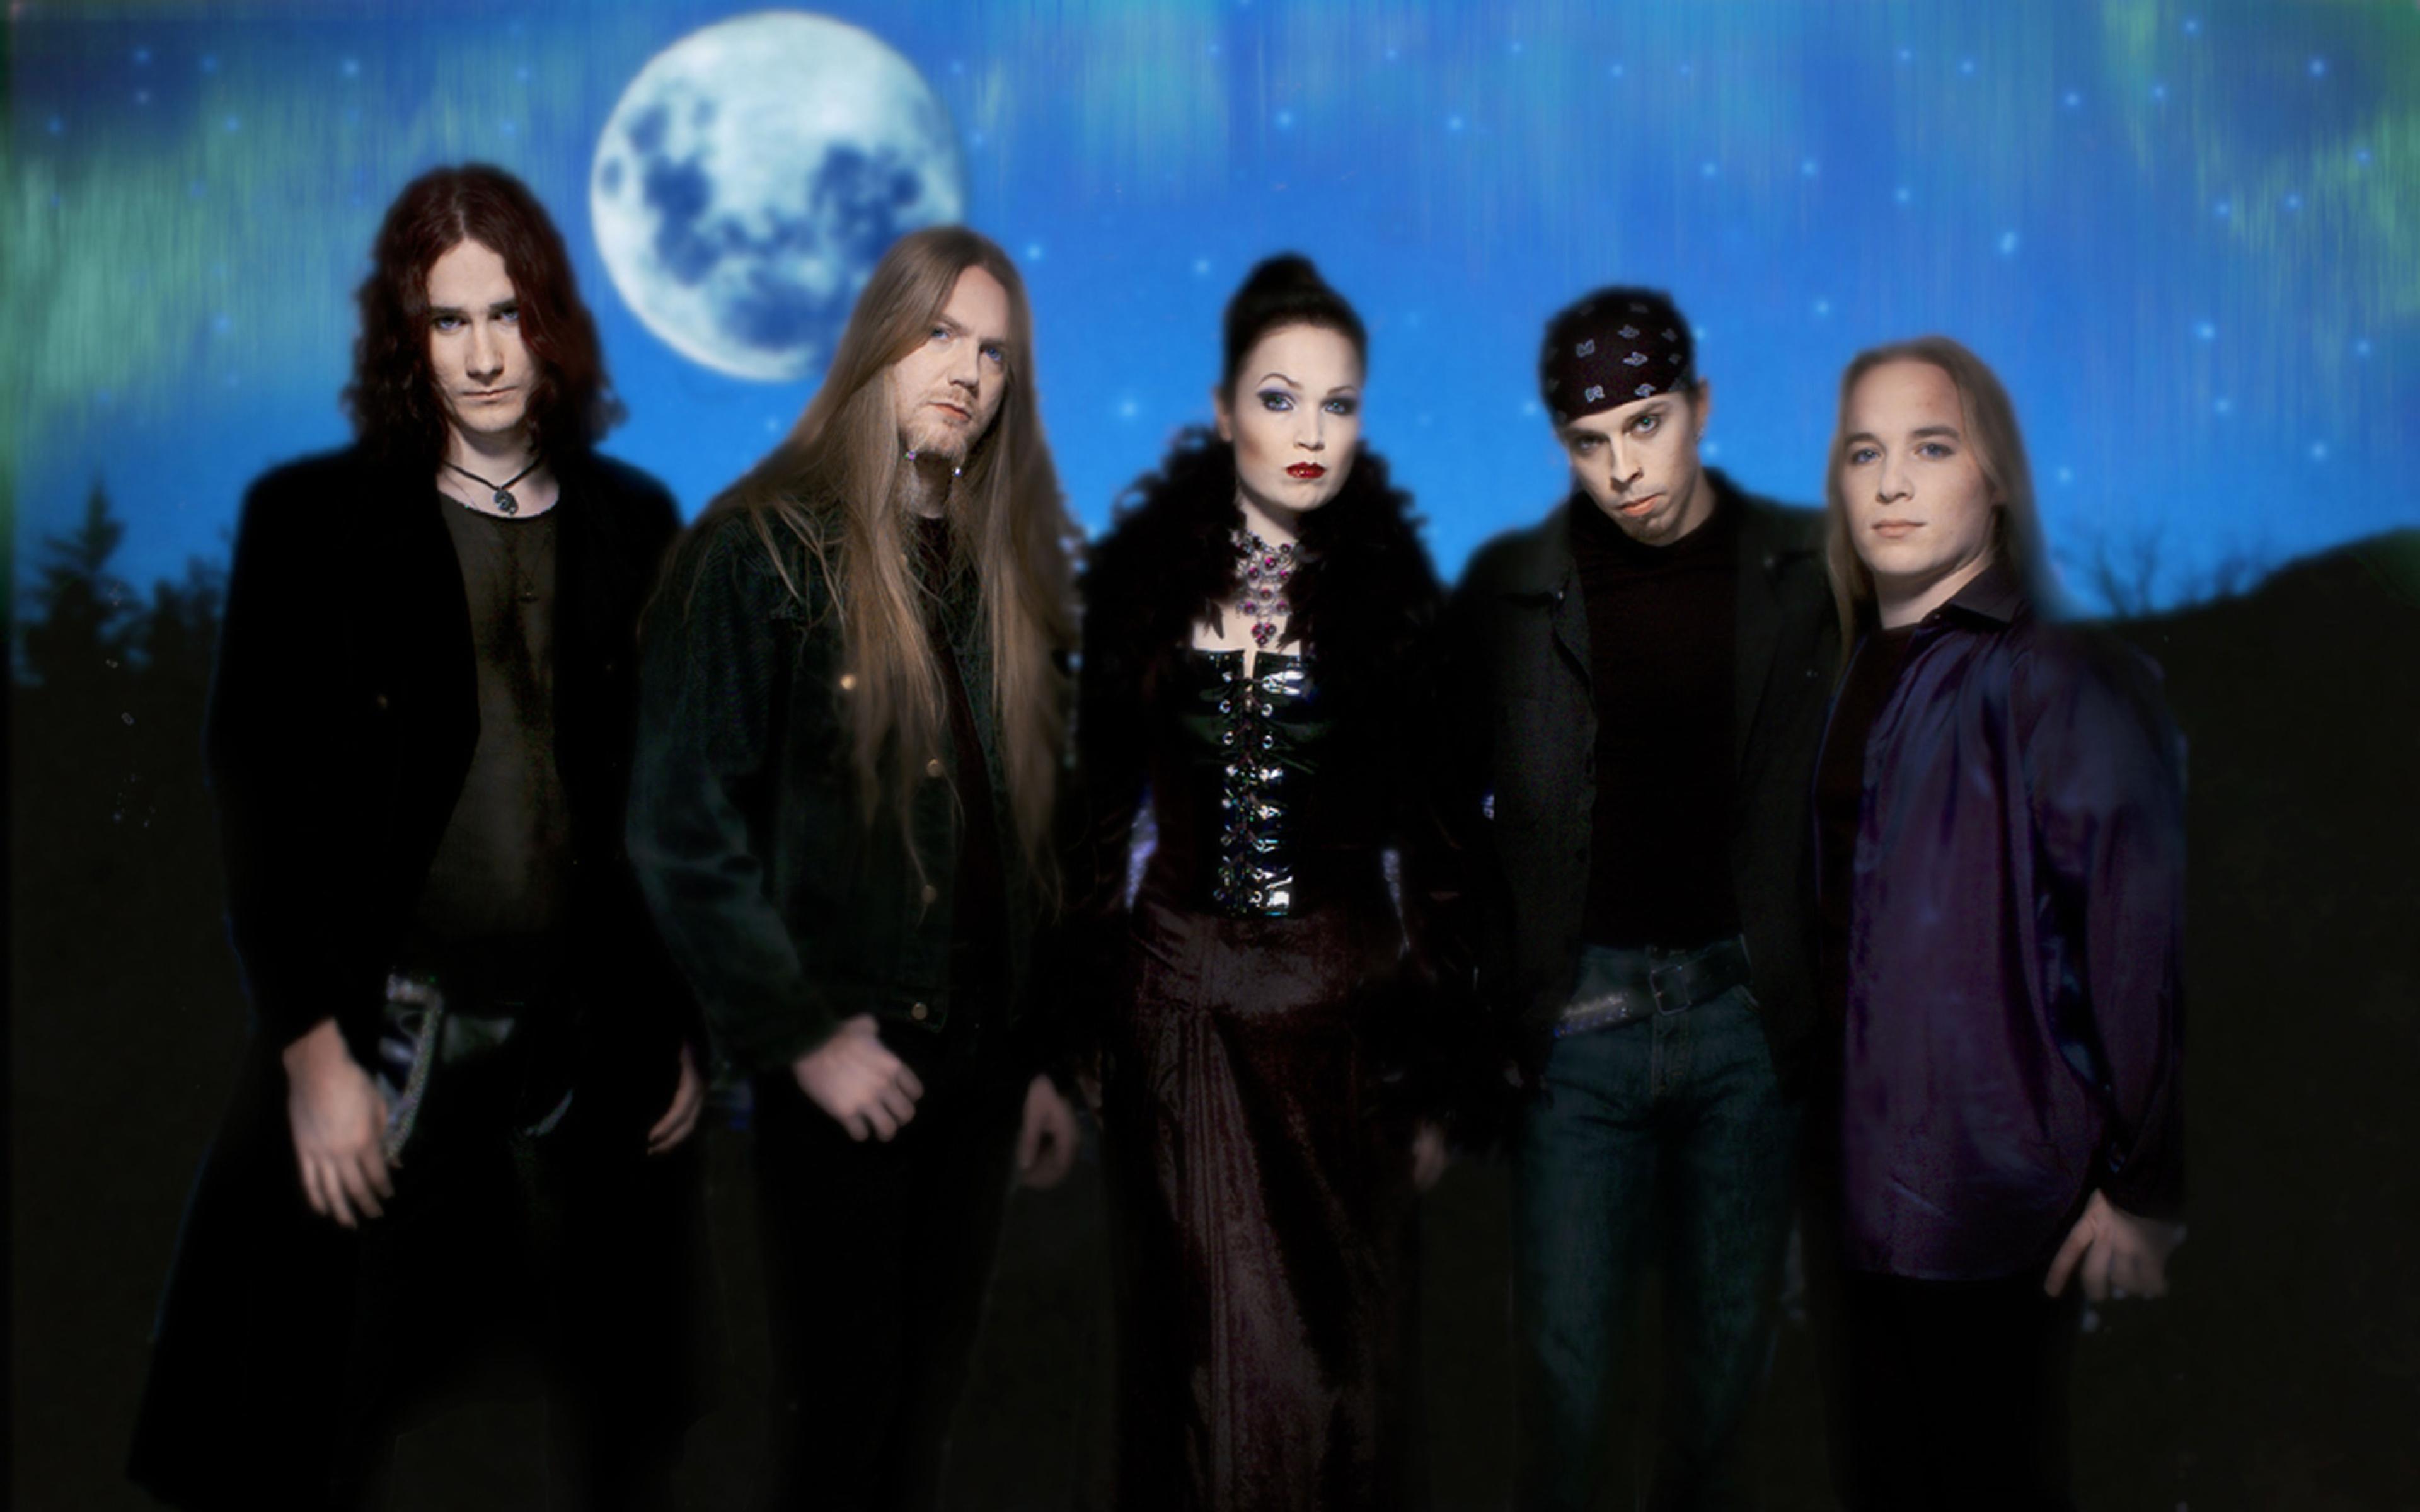 Mejores singles de Nightwish (1997-2002) Nightwish1